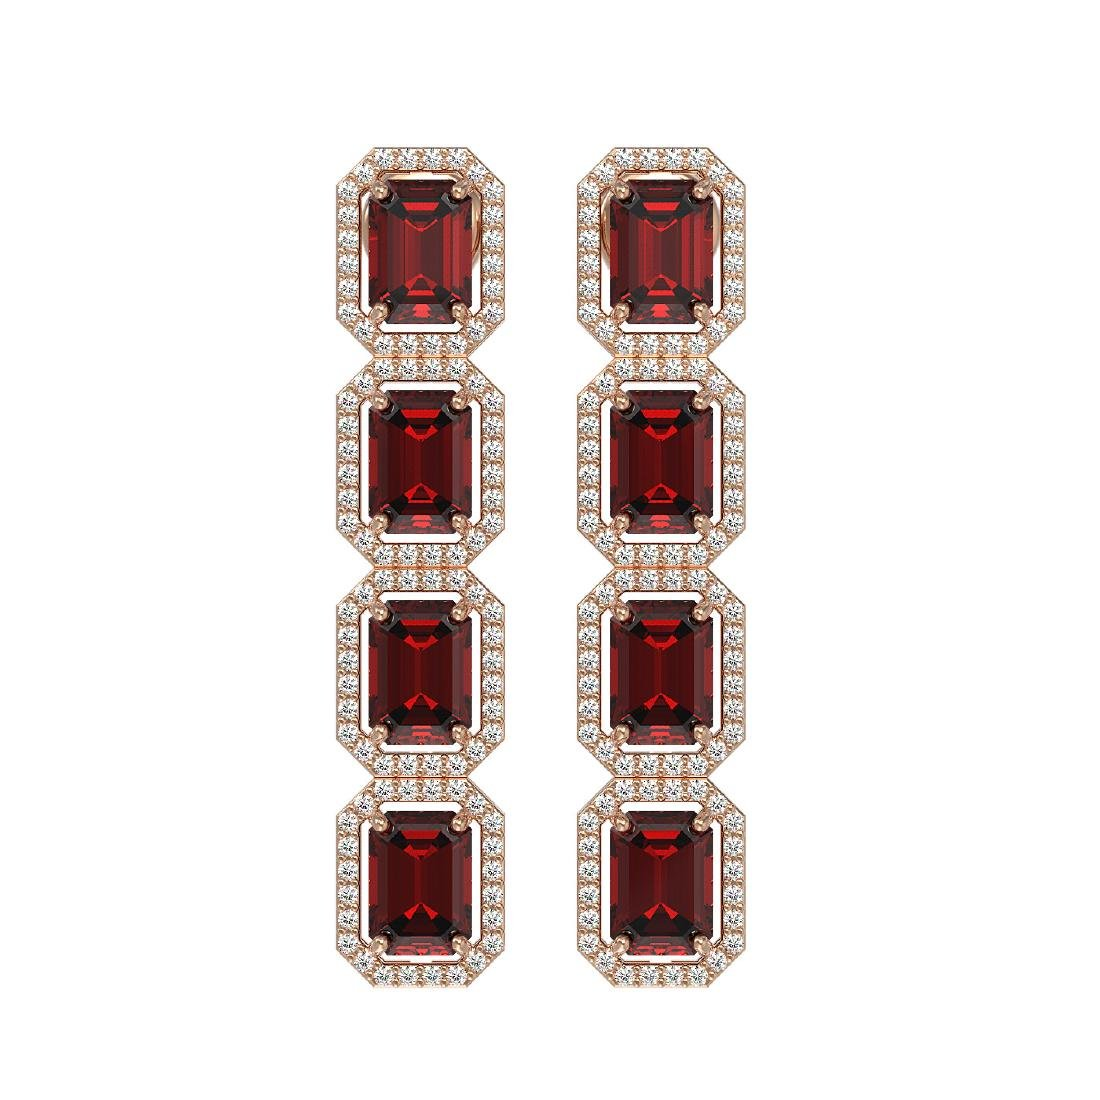 12.73 CTW Garnet & Diamond Halo Earrings 10K Rose Gold